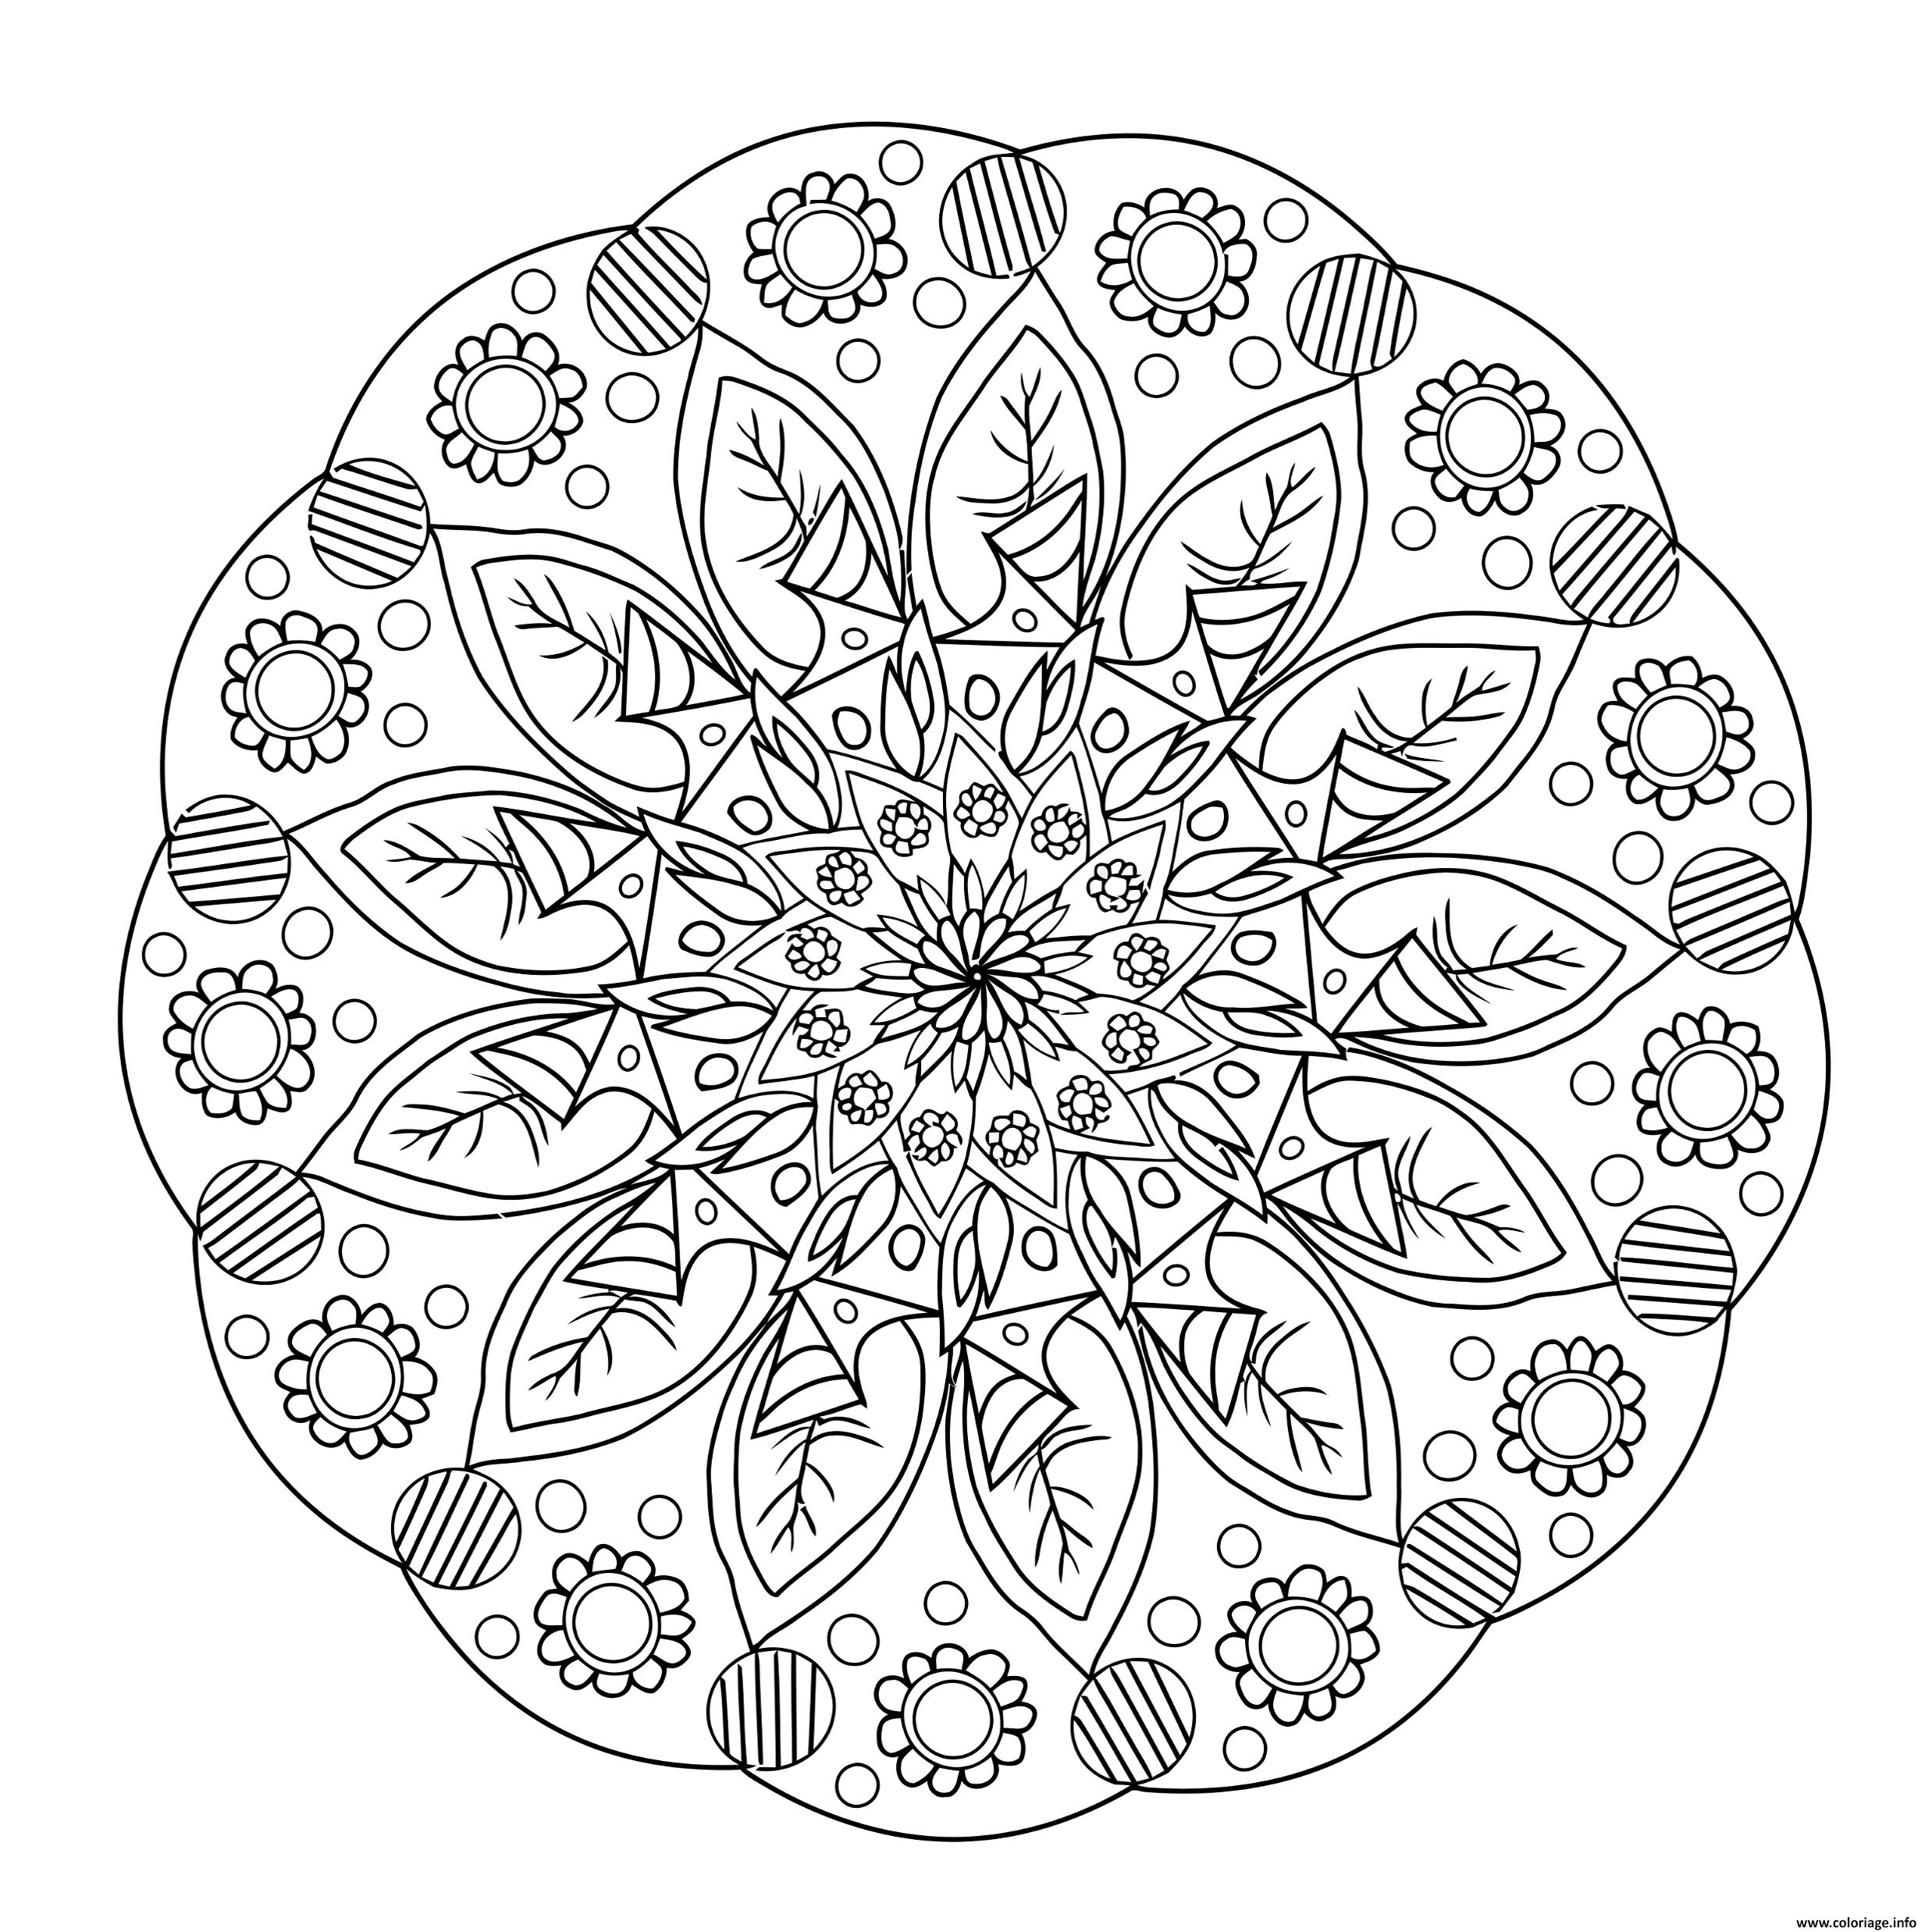 Coloriage flowers mandala 2 dessin - Mandala coloriage ...